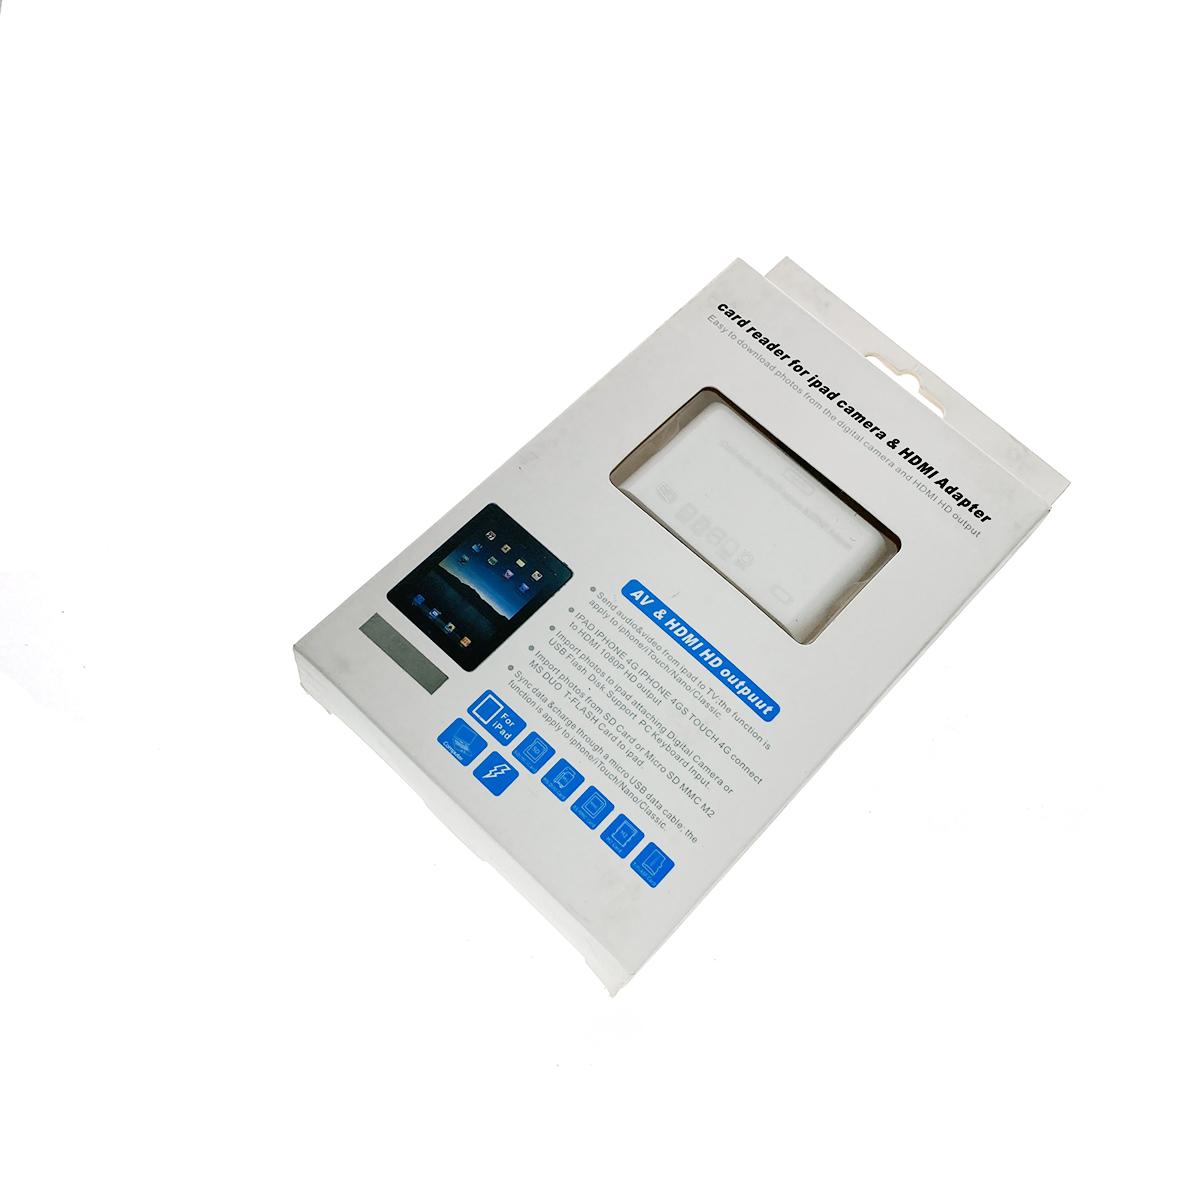 Картридер+видеоадаптер Ipad 30pin to HDMI/AV/microUSB/SD/MMC/MS/M2, Espada C02Ip